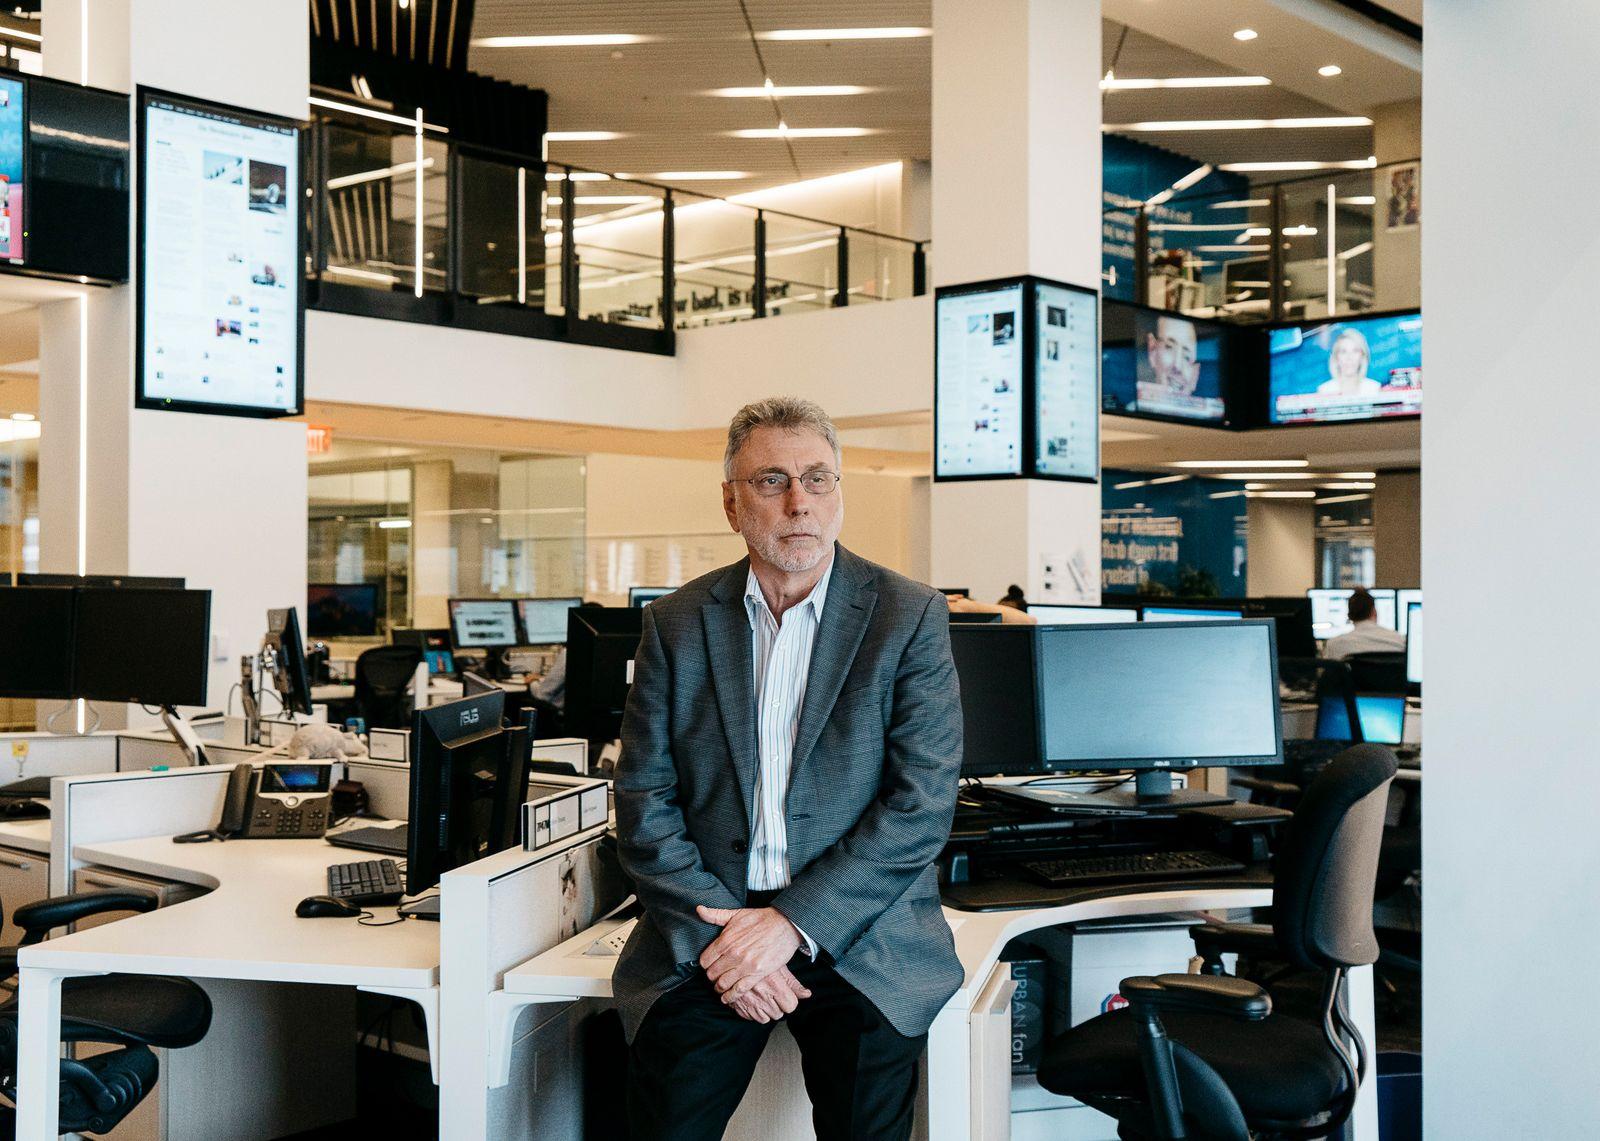 Martin Baron, executive editor of The Washington Post, in the newspaper's newsroom in Washington.